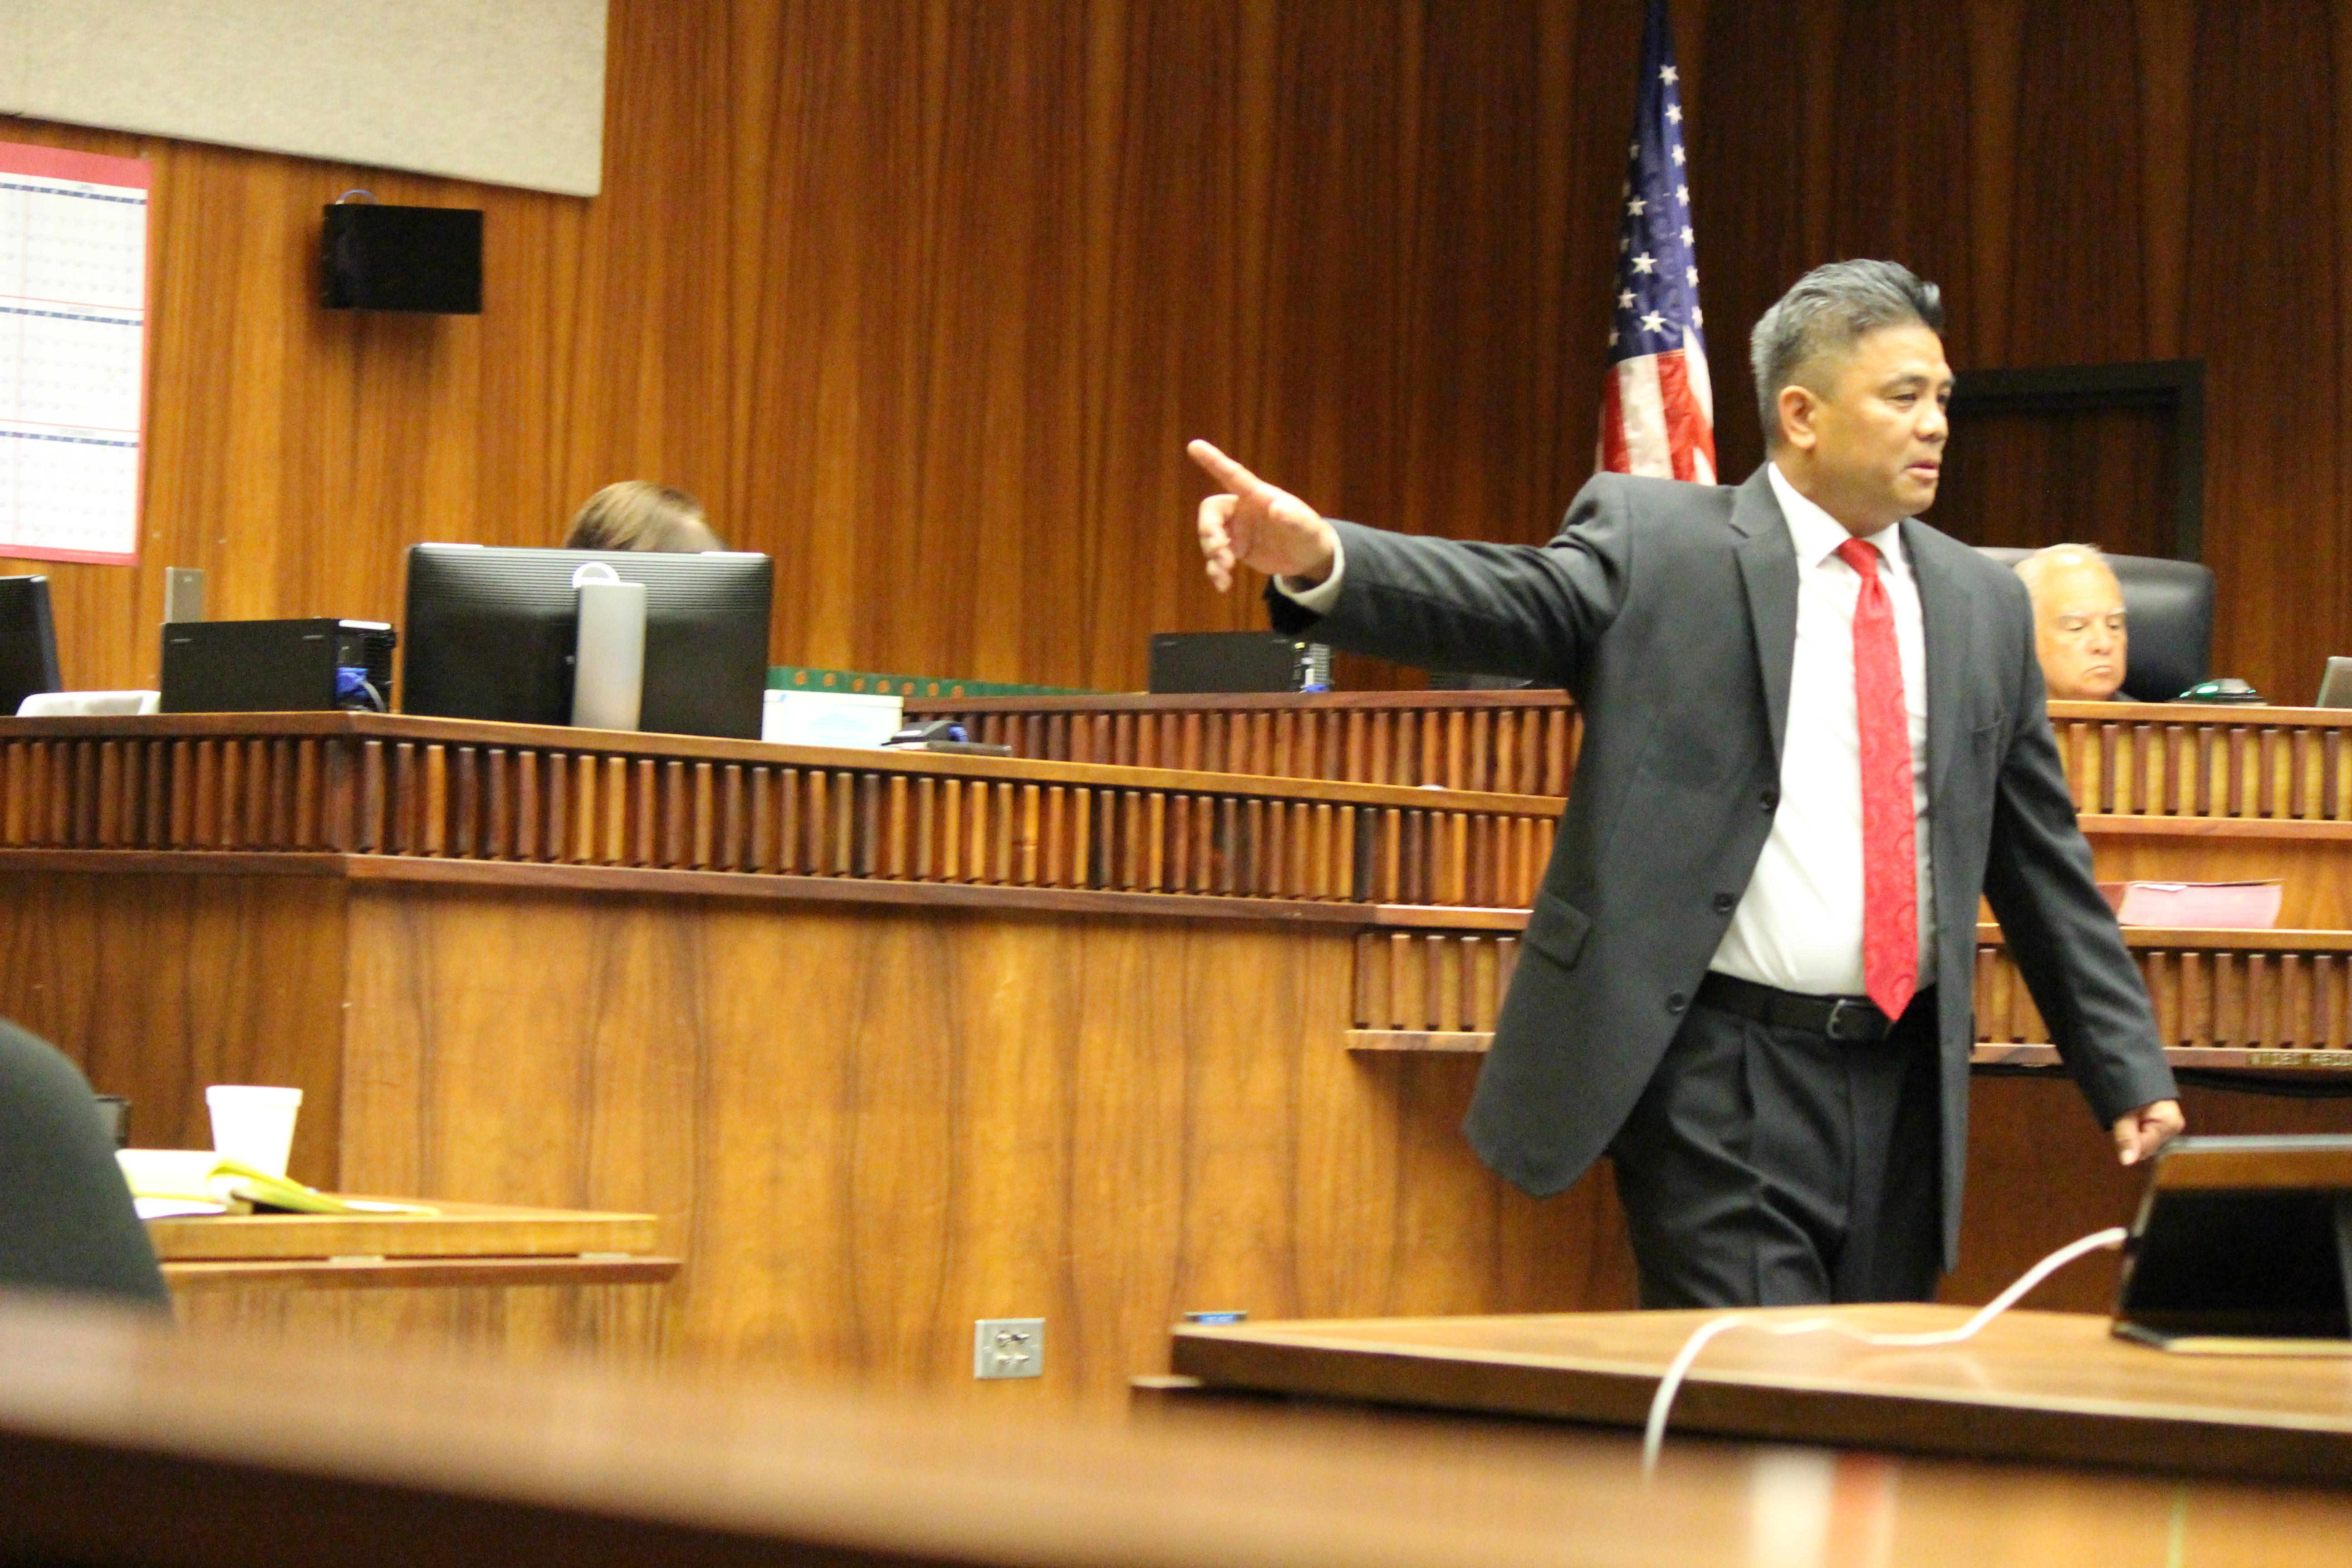 Prosecuting Attorney Robert Rivera. Photo 11.29.16 by Wendy Osher.